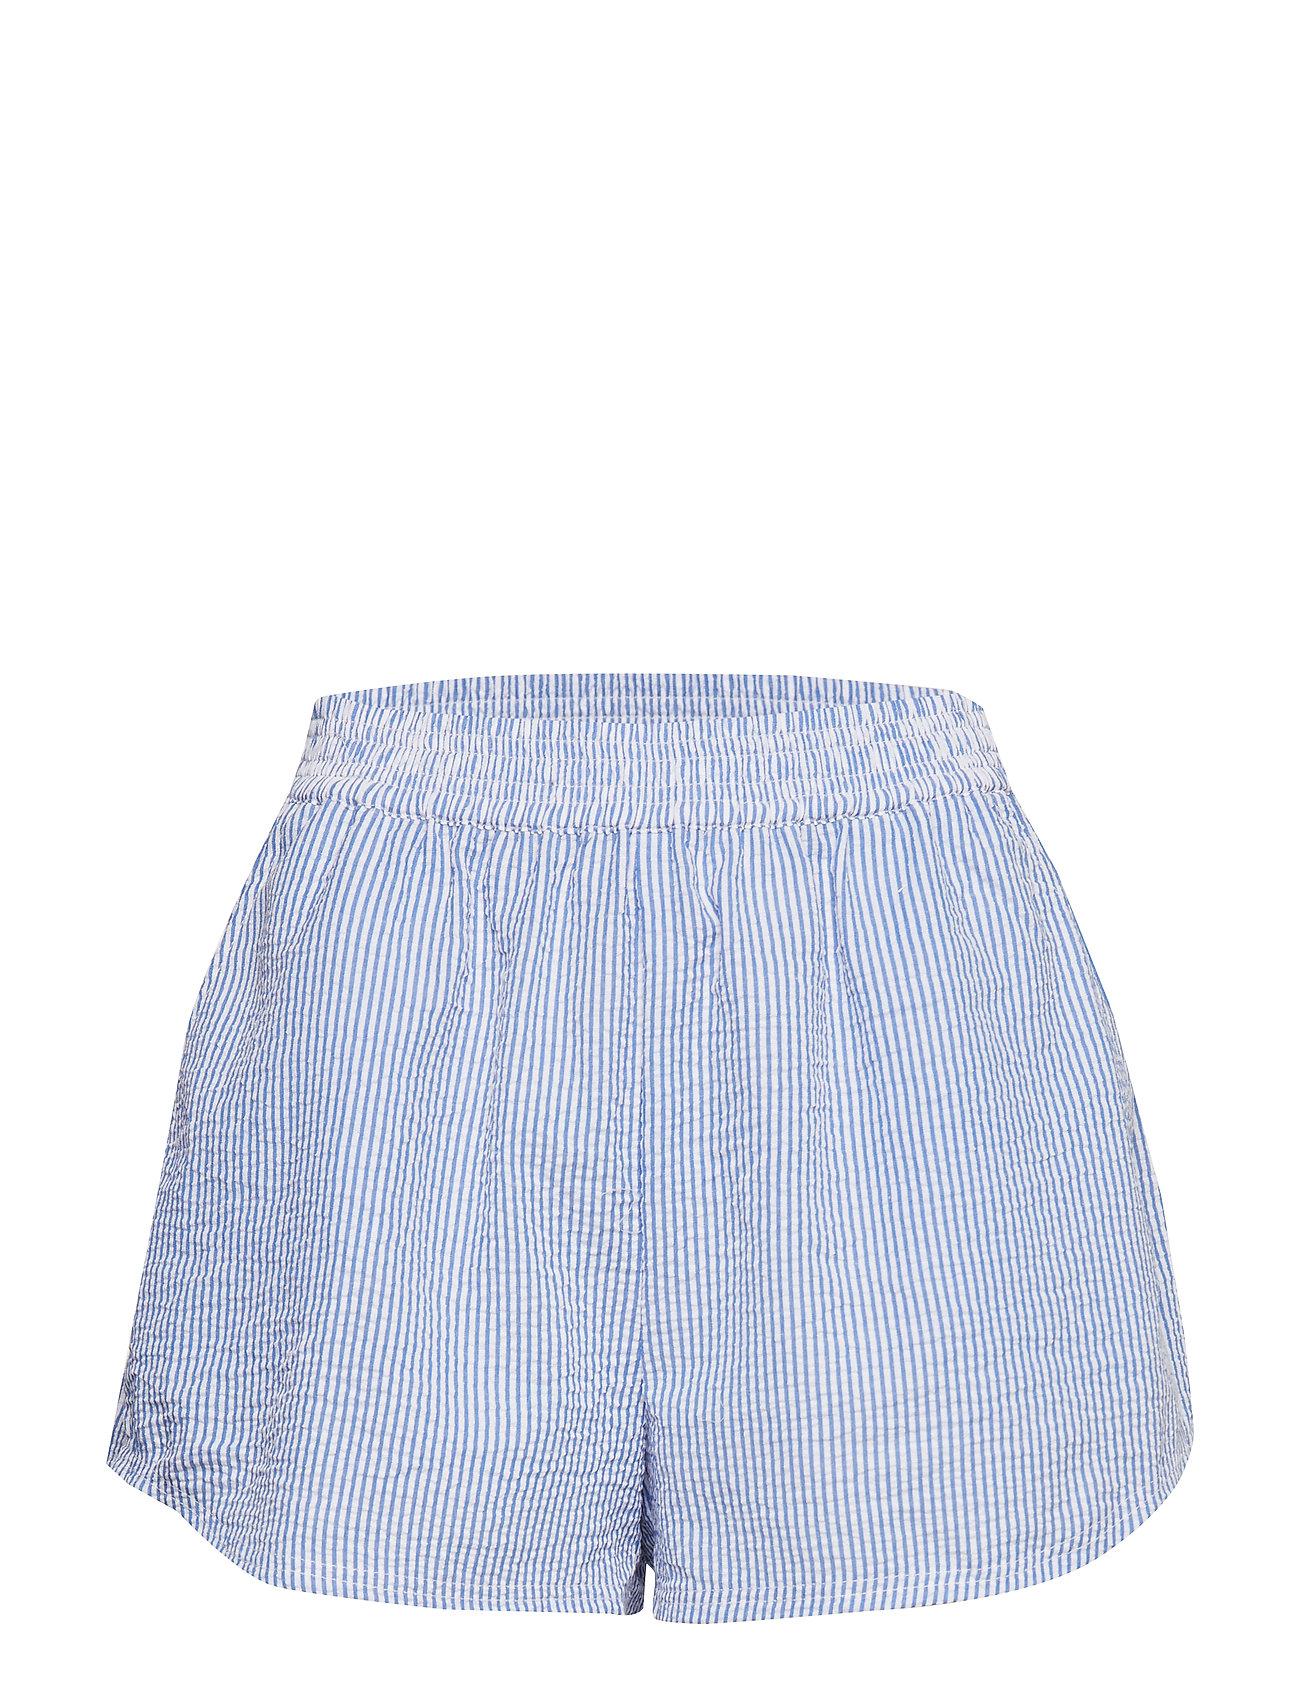 Ivyrevel High Waisted Shorts - BLUE MIX